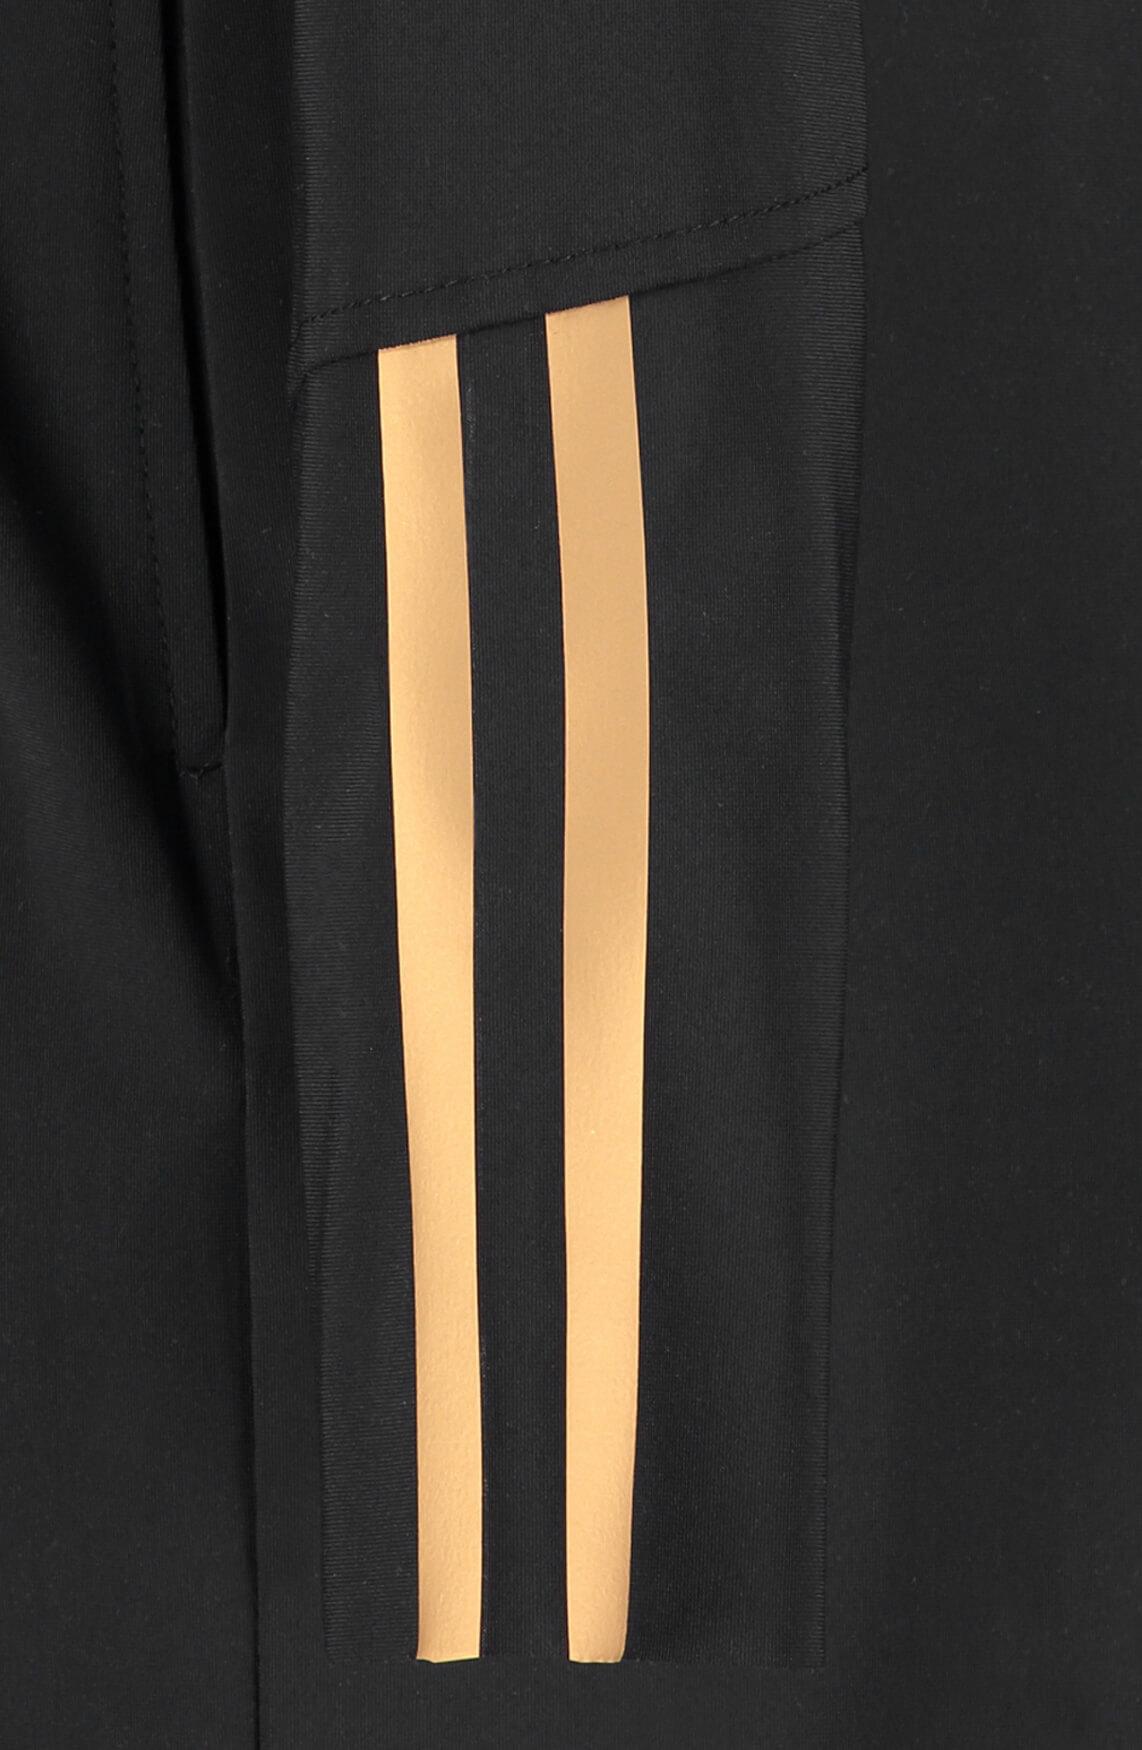 Jane Lushka Dames Amalia jurk zwart